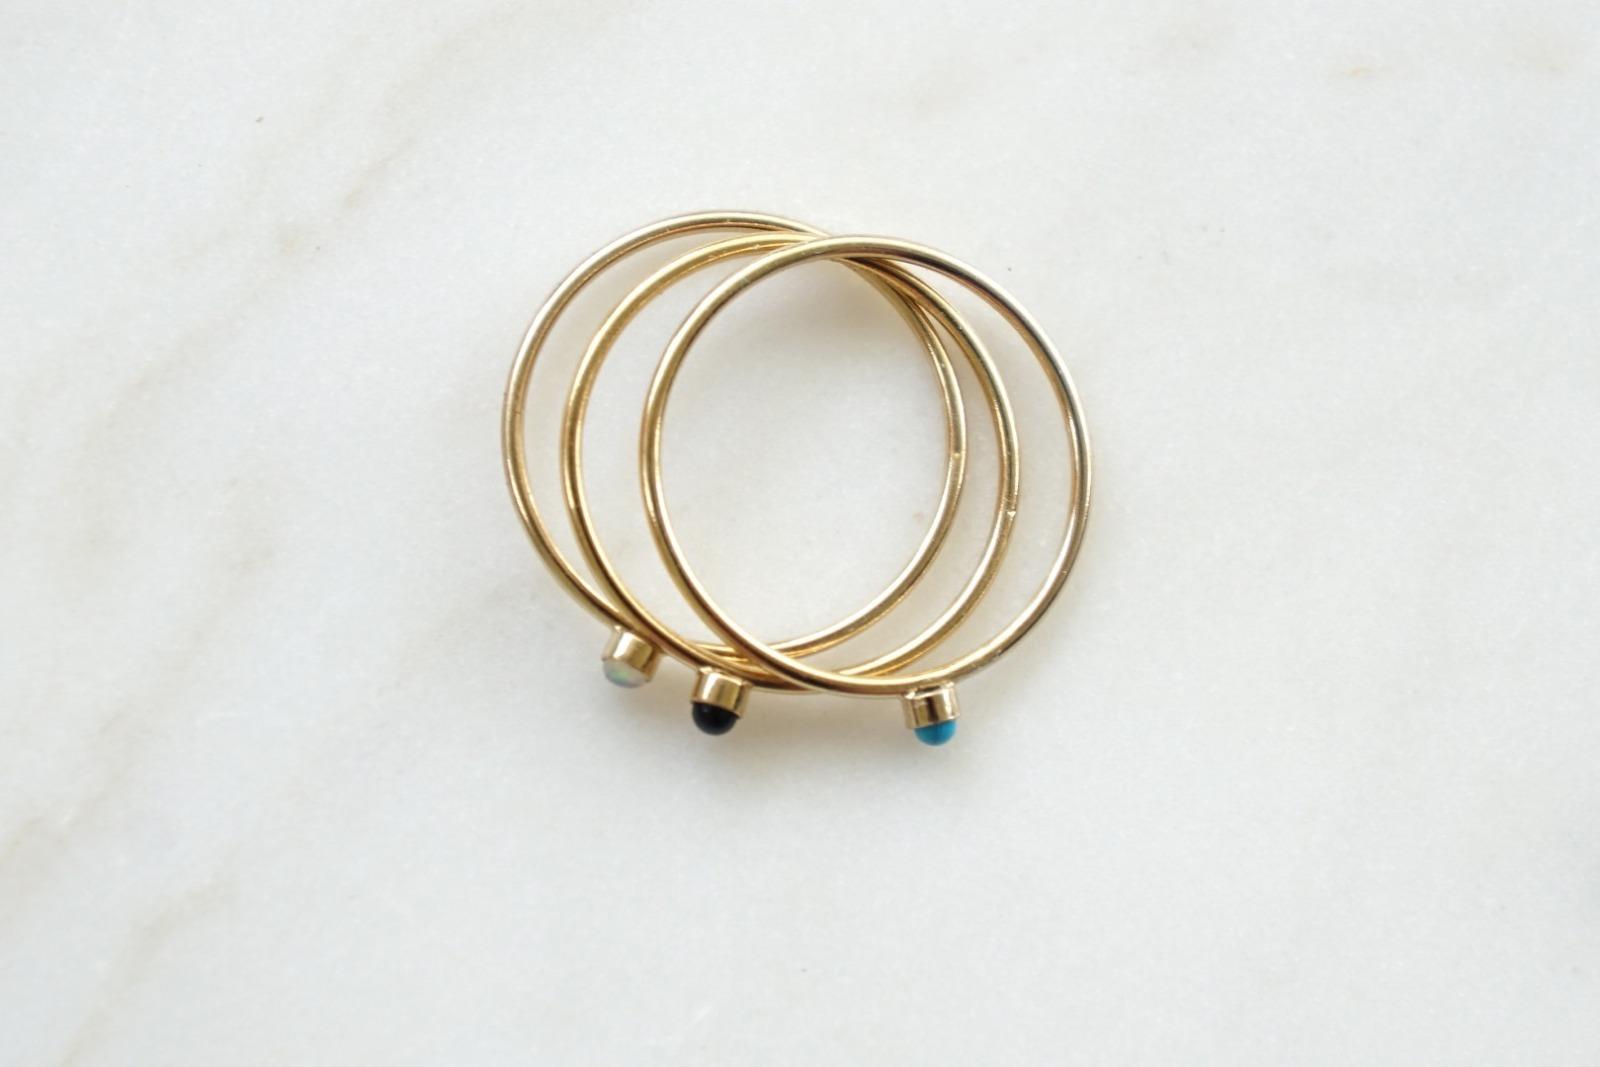 Zierlicher Ring Stapelring vergoldet Rosa Opal Fassung - 3